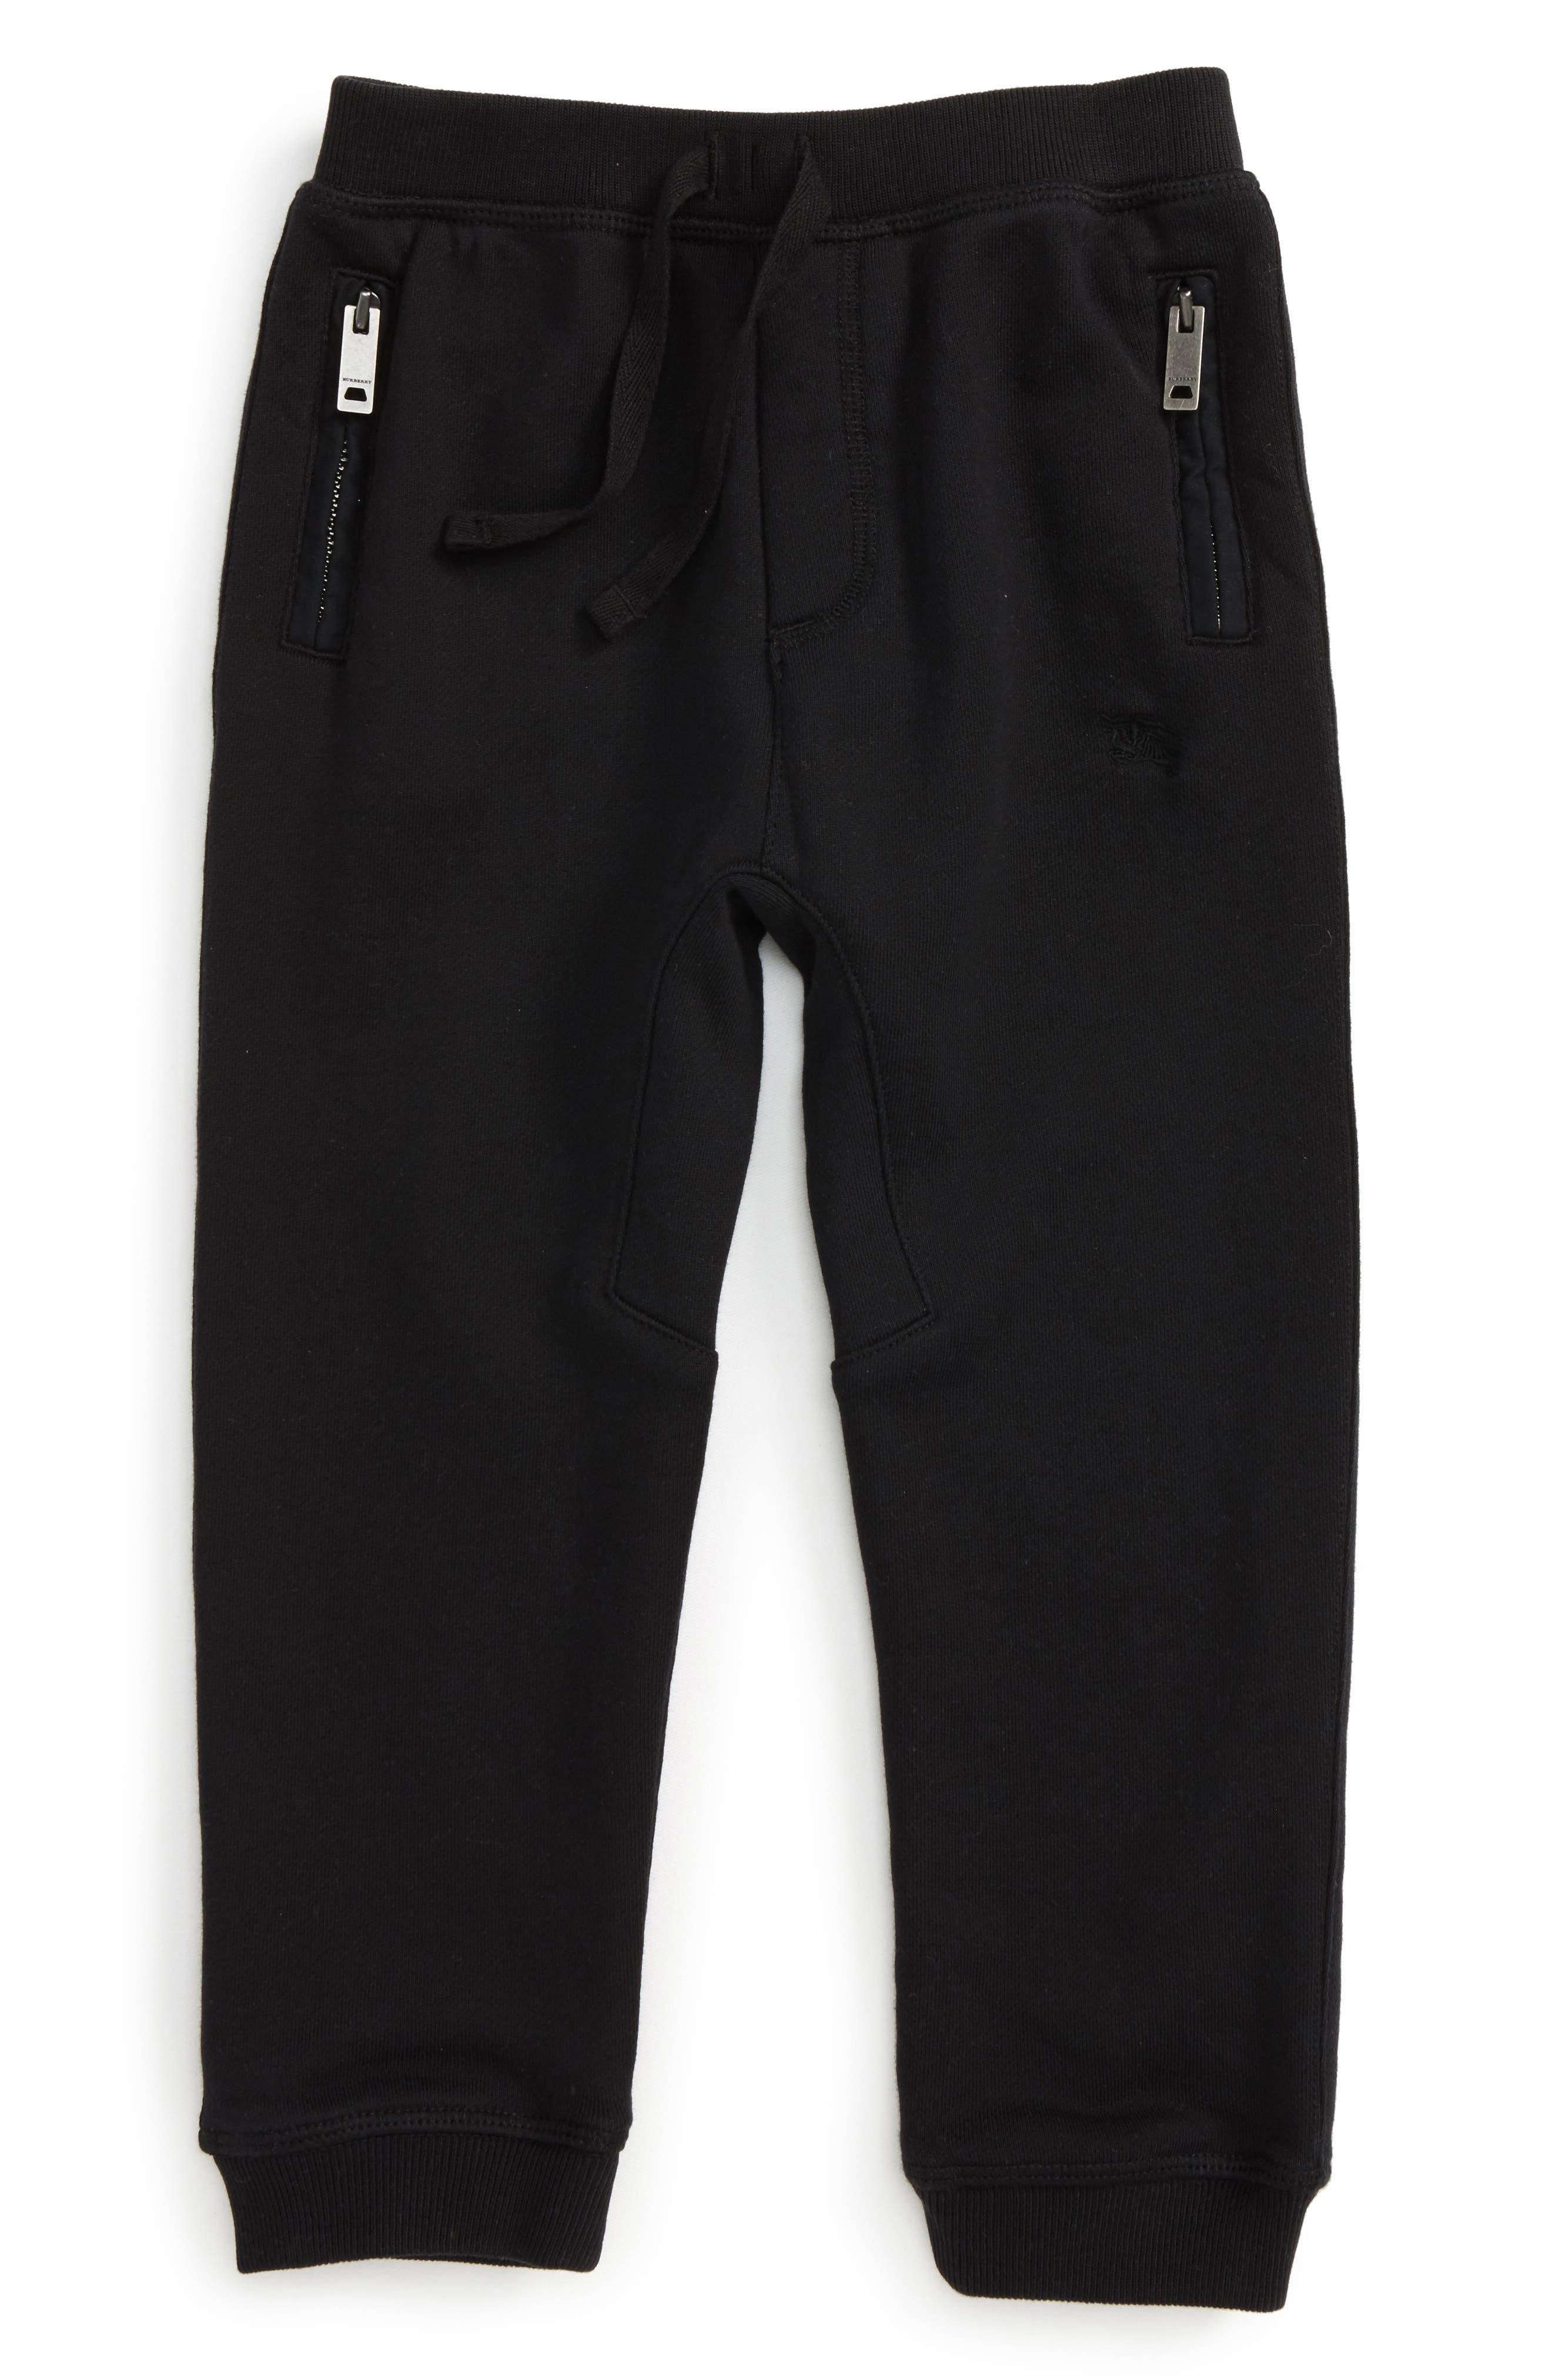 Main Image - Burberry 'Mini Phill' Sweatpants (Baby Boys)